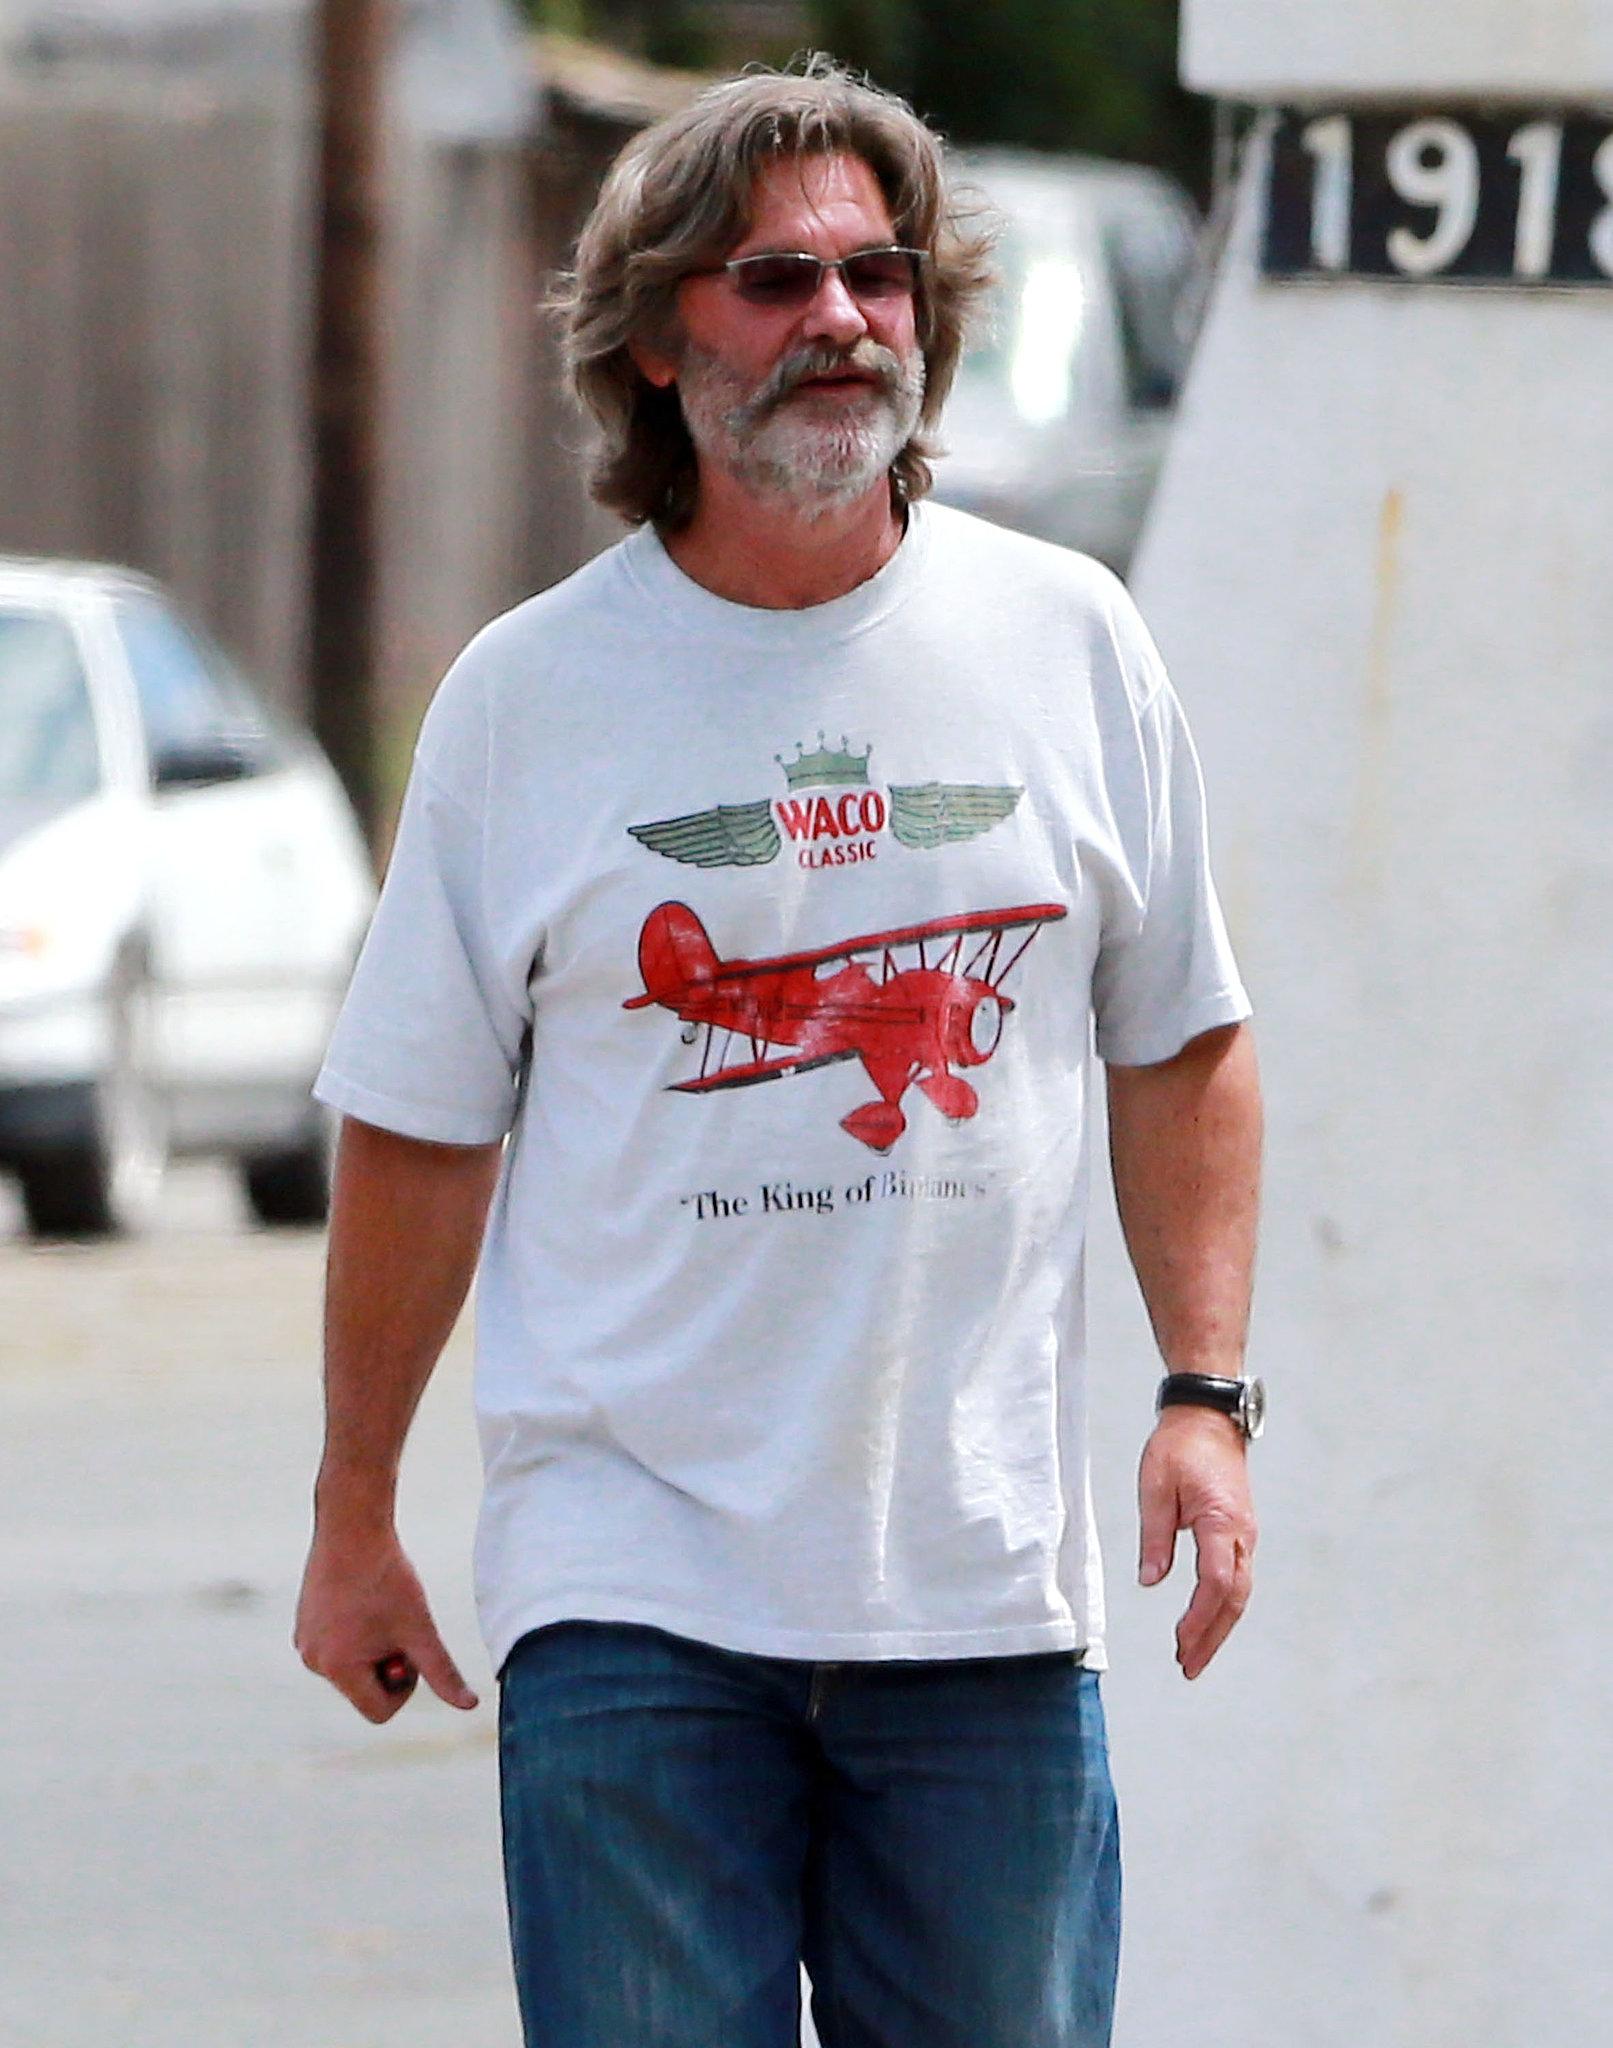 Kurt Russell went wine tasting on Monday.